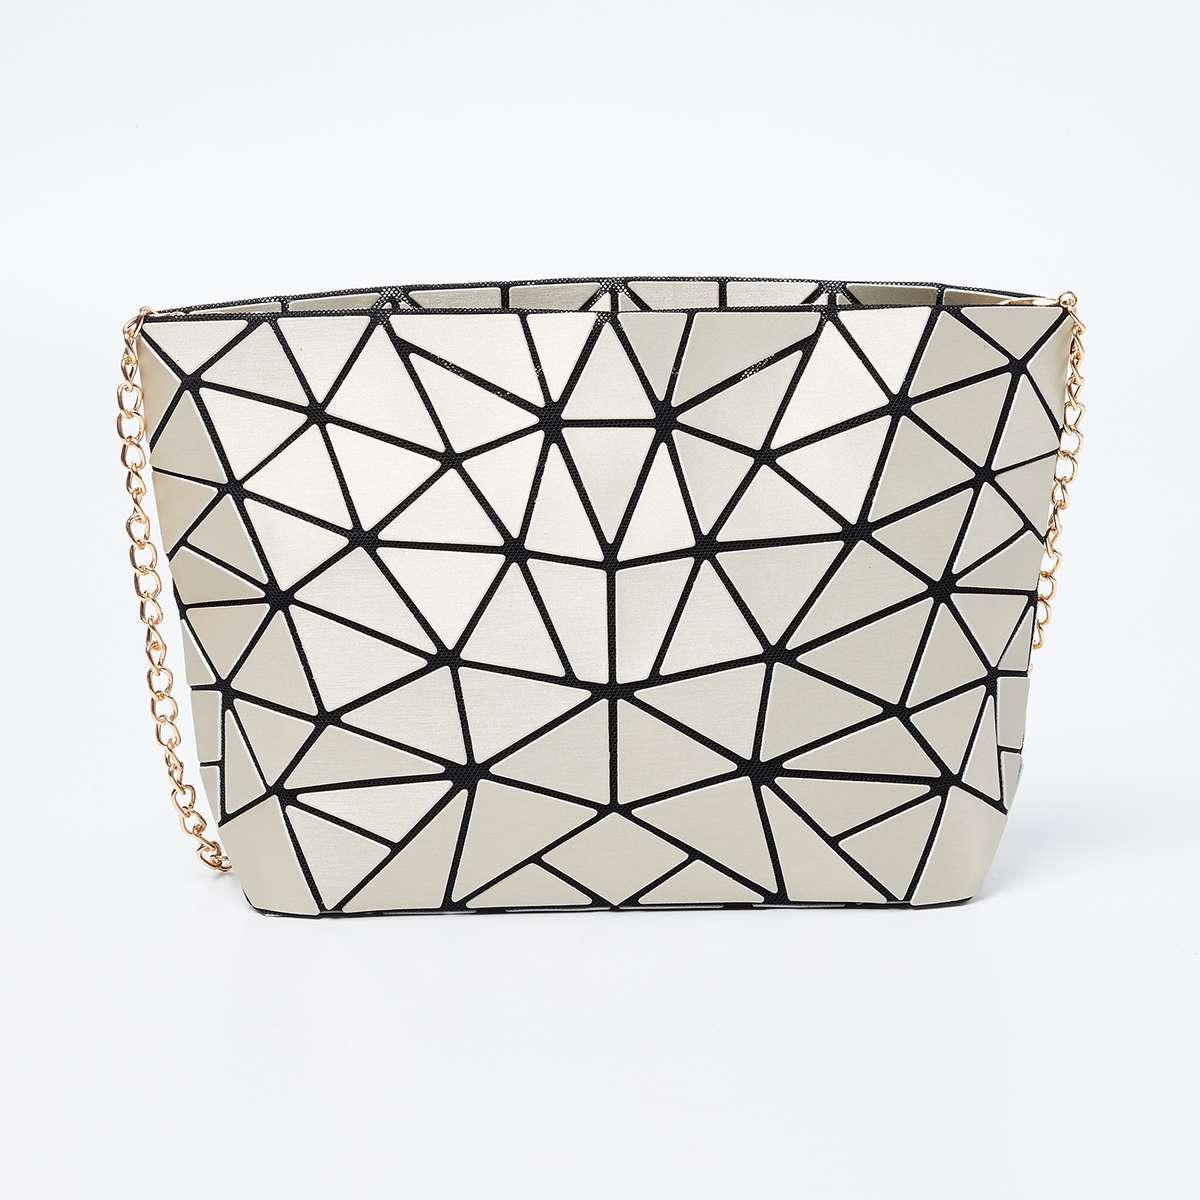 4.GINGER Geometric Pattern Sling Bag